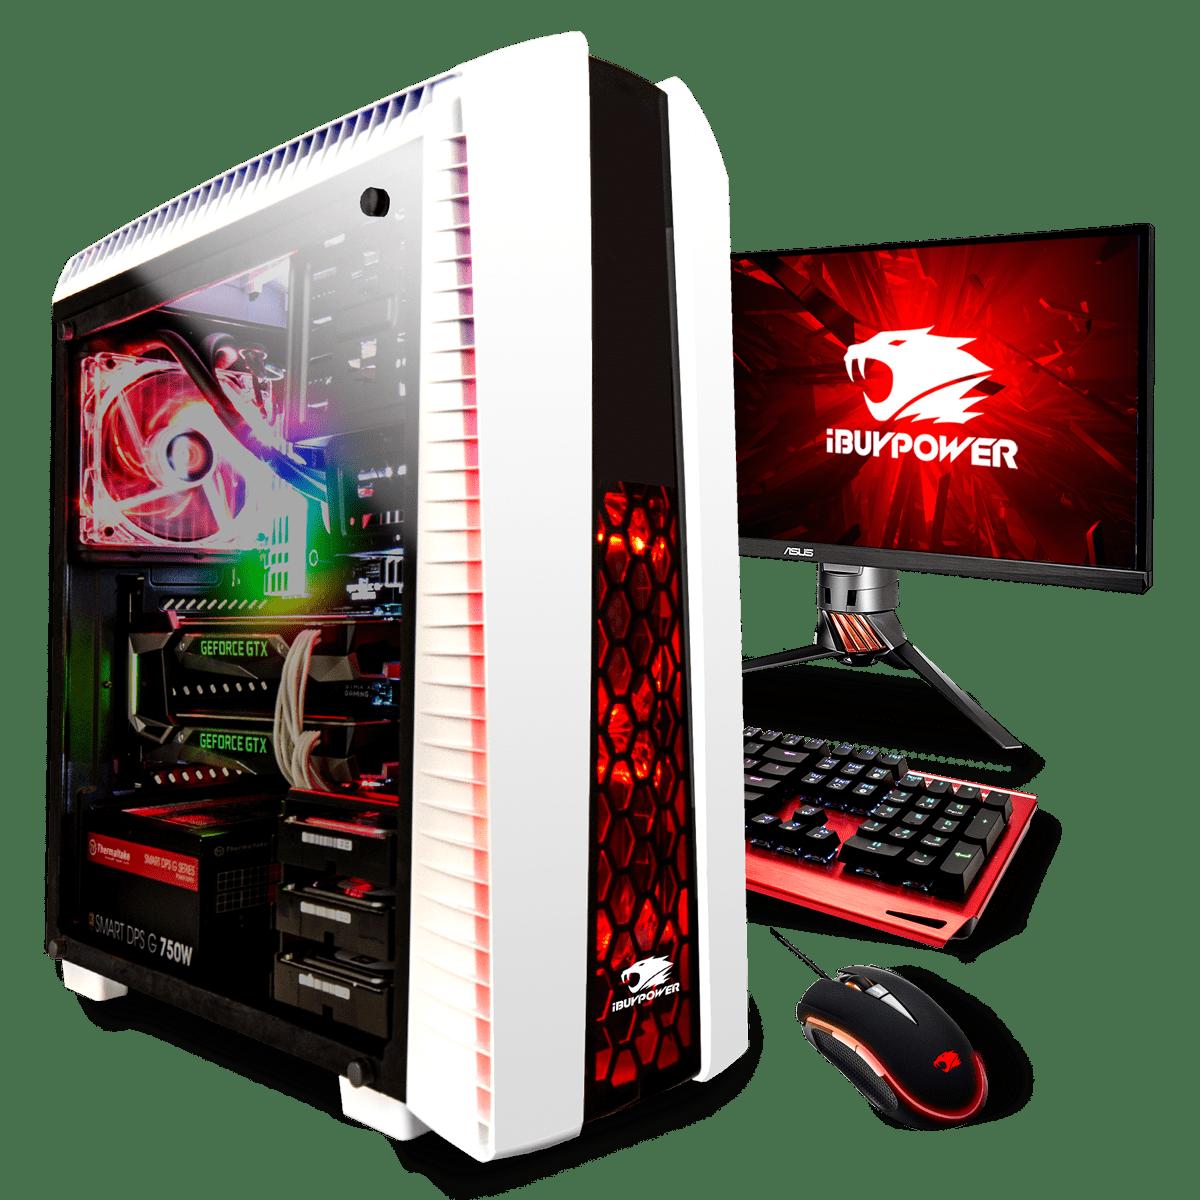 Gamer Paladin E840 Th Ibuypower Gaming Pc Frame Keybord Laptop Asus X 455 Casing 323 Customer Reviews